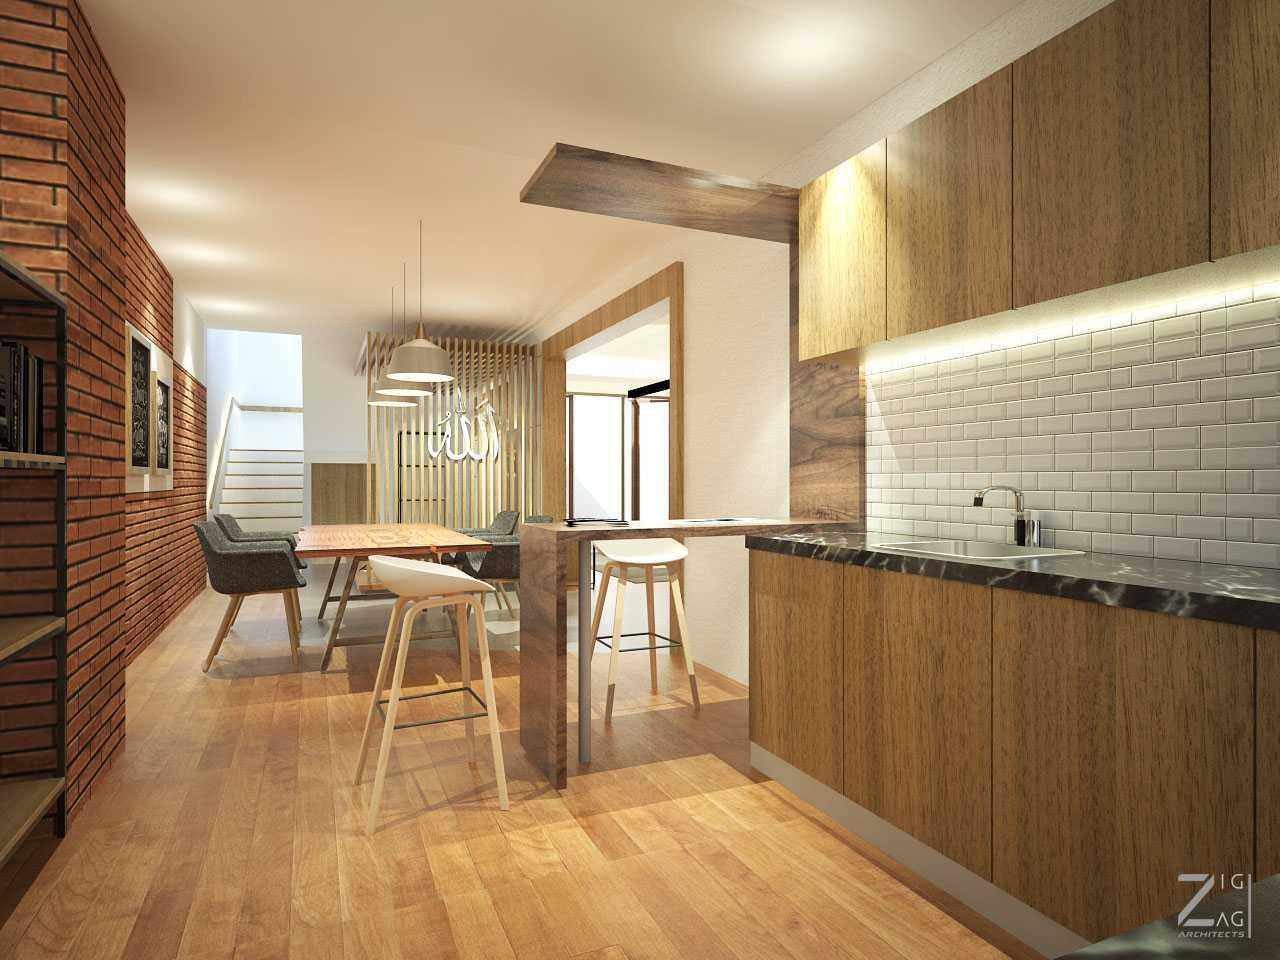 Zigzag Architecture Studio Pulomas House Daerah Khusus Ibukota Jakarta, Indonesia  Dining-View02   37602